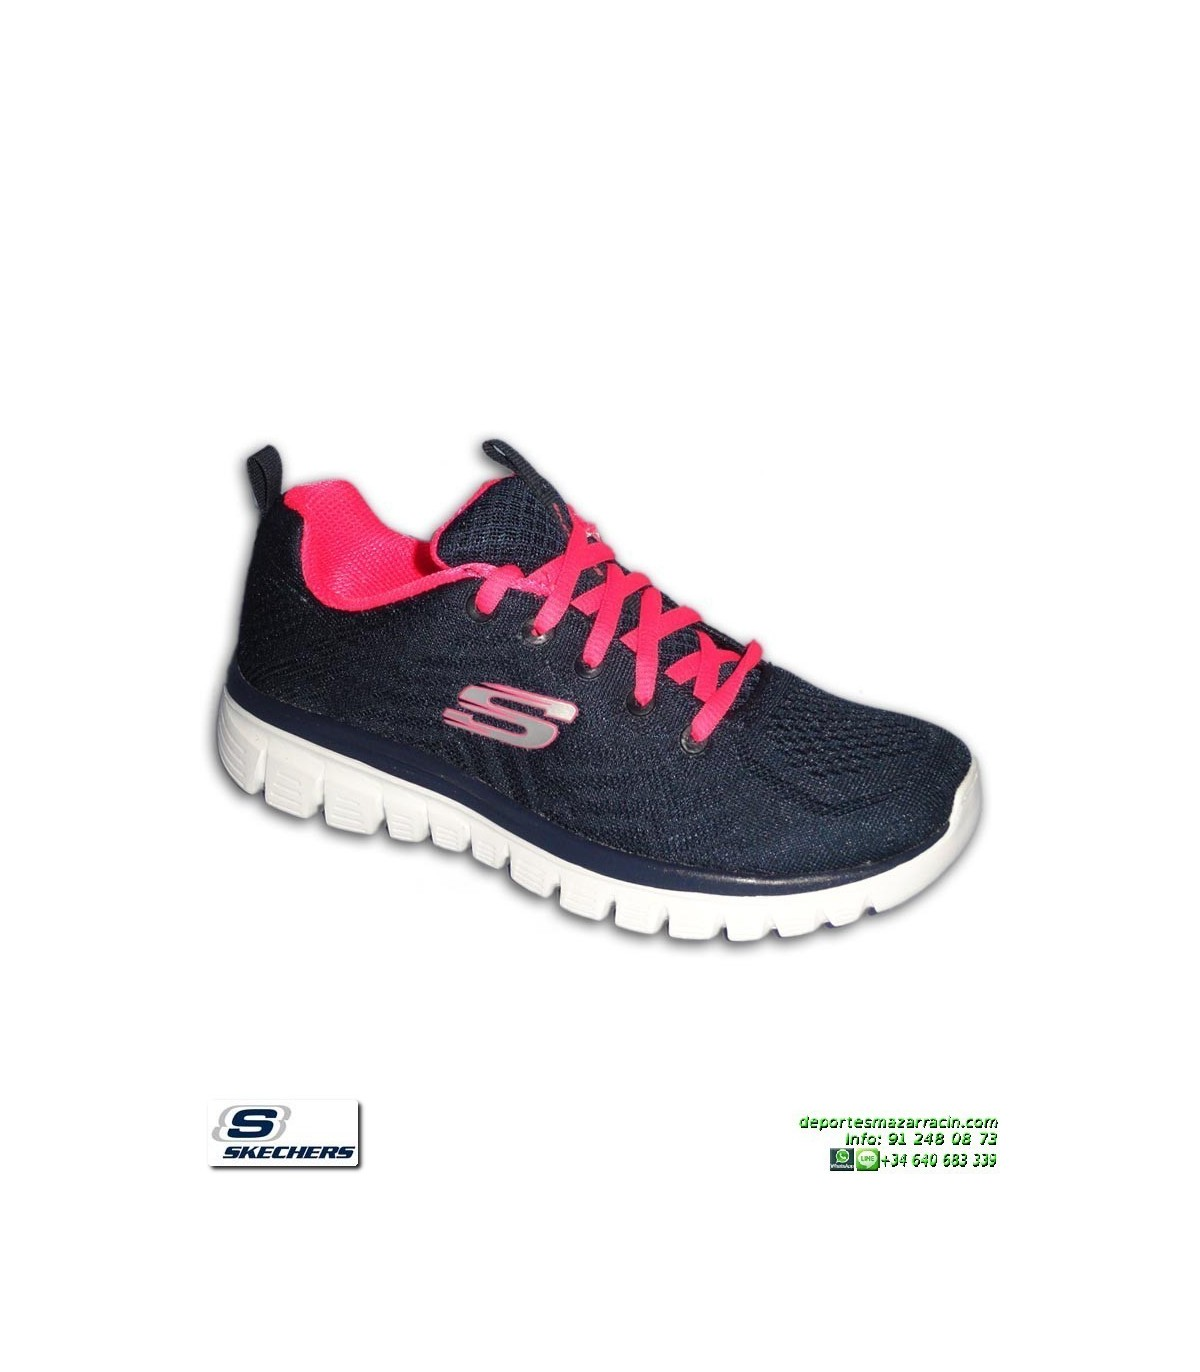 86bb364f6 Deportiva Skechers Mujer GRACEFUL Get Connected marino-rosa 12615 NVHP  PANTILLA Memory Foam. Deportiva Skechers ...